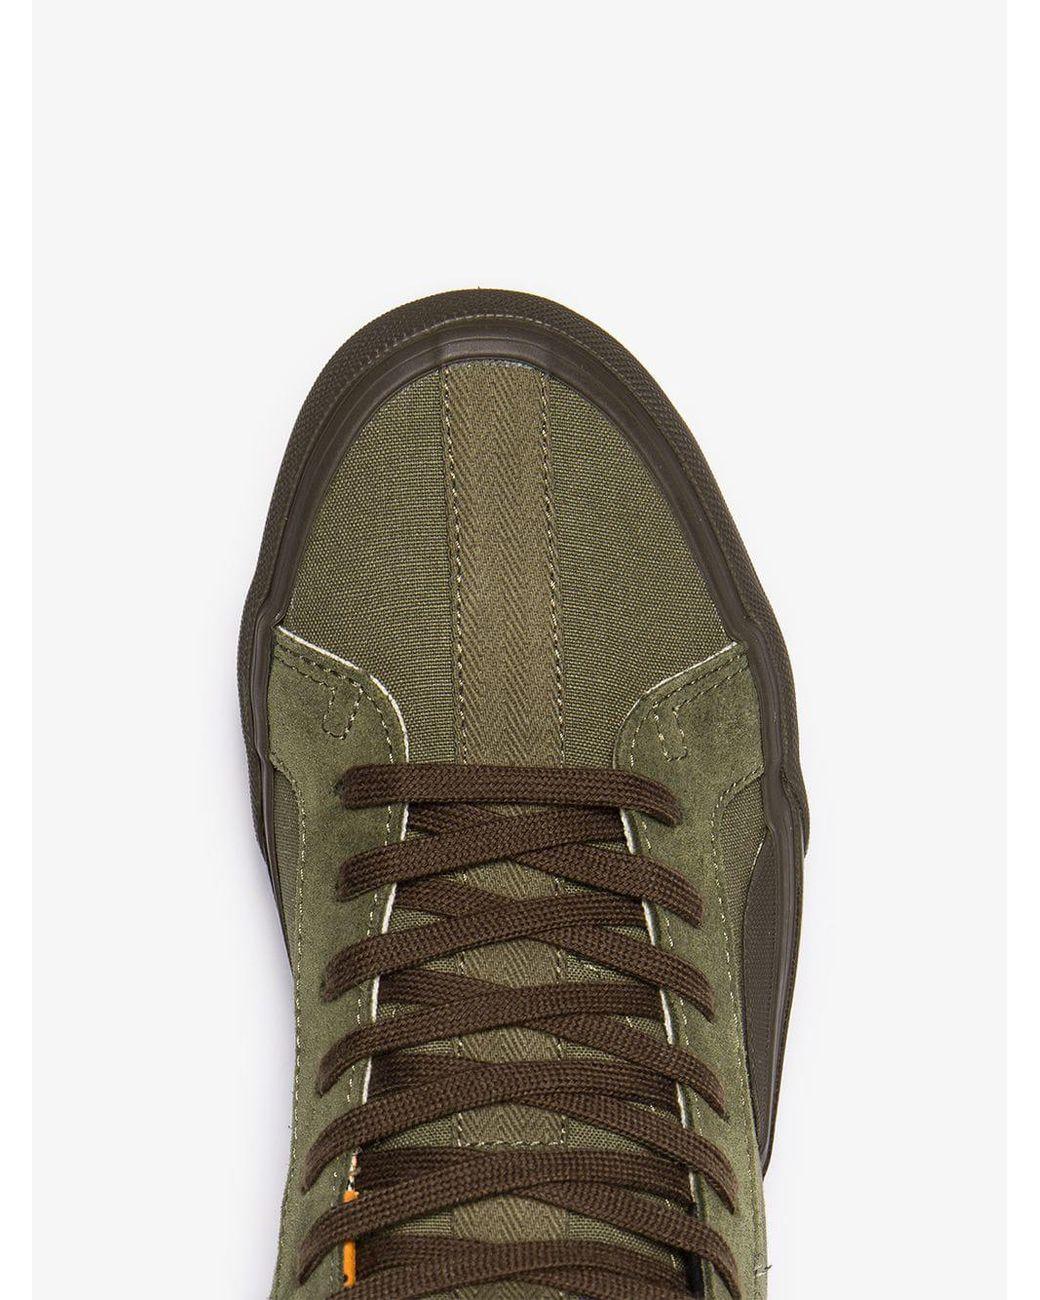 60459753e5 Lyst - Vans Green Vault Cotton High Top Trainers in Green for Men